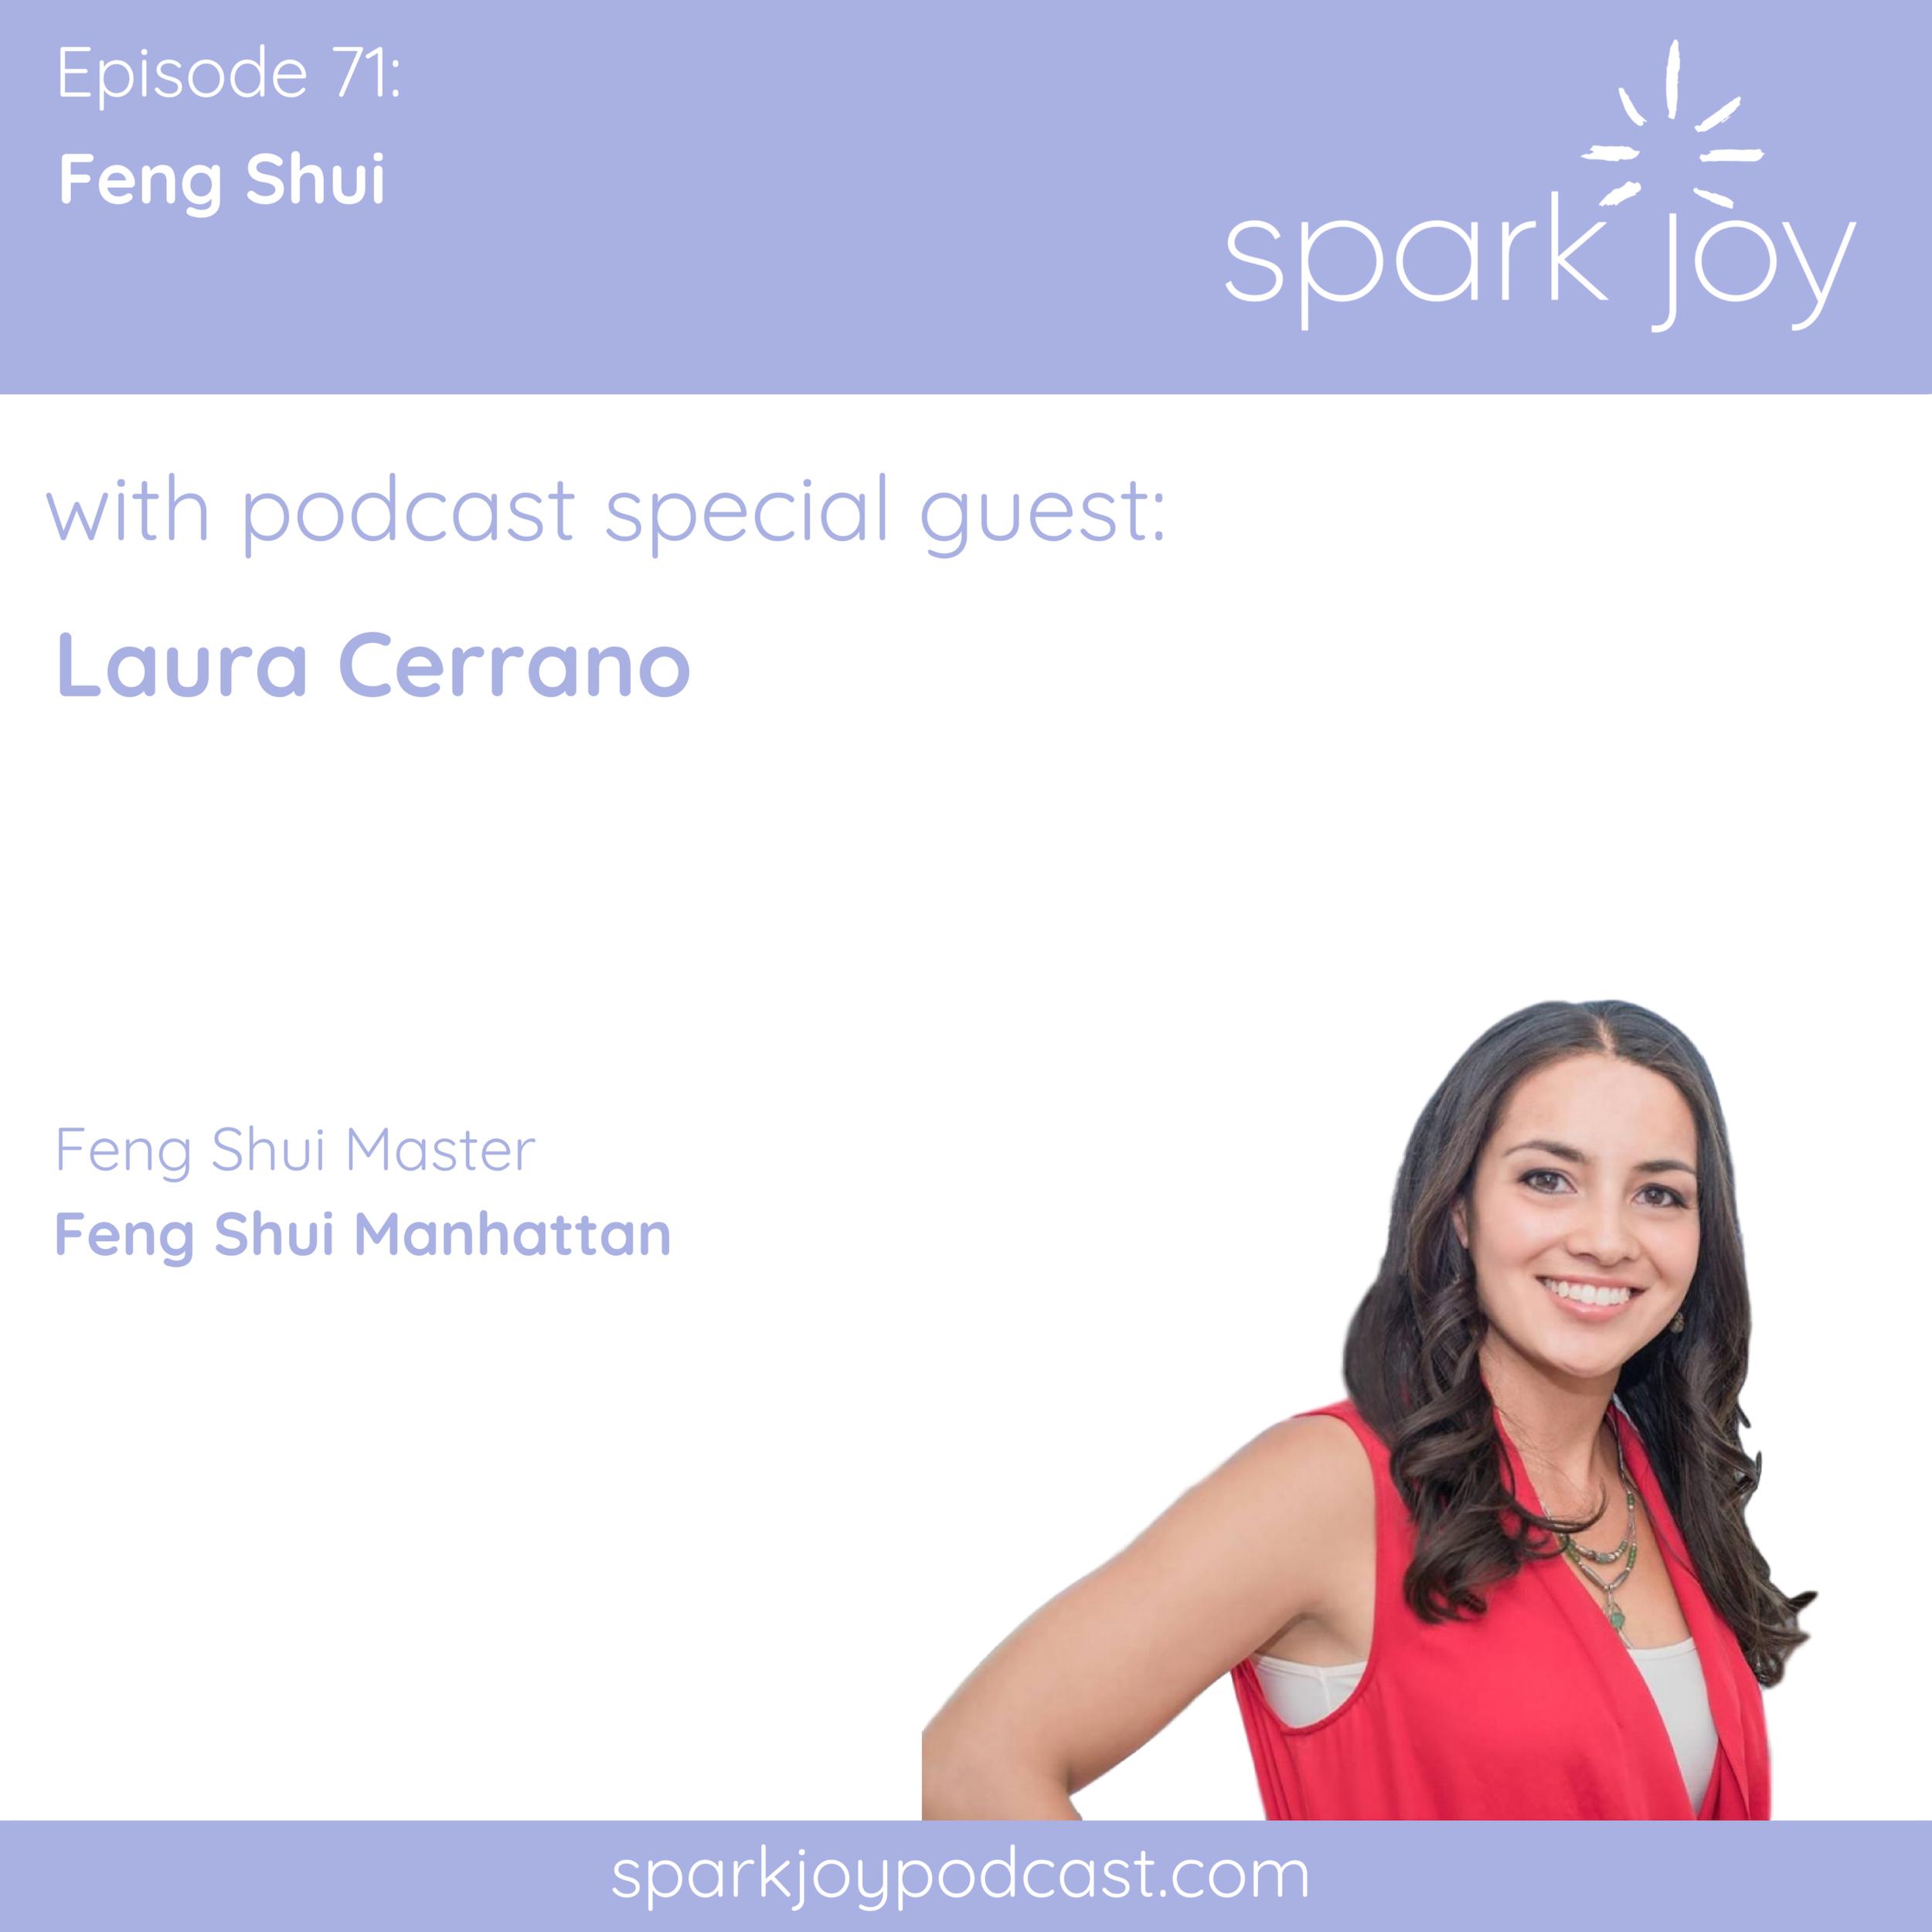 spark joy podcast feng shui manhattan consultant laura cerrano.png